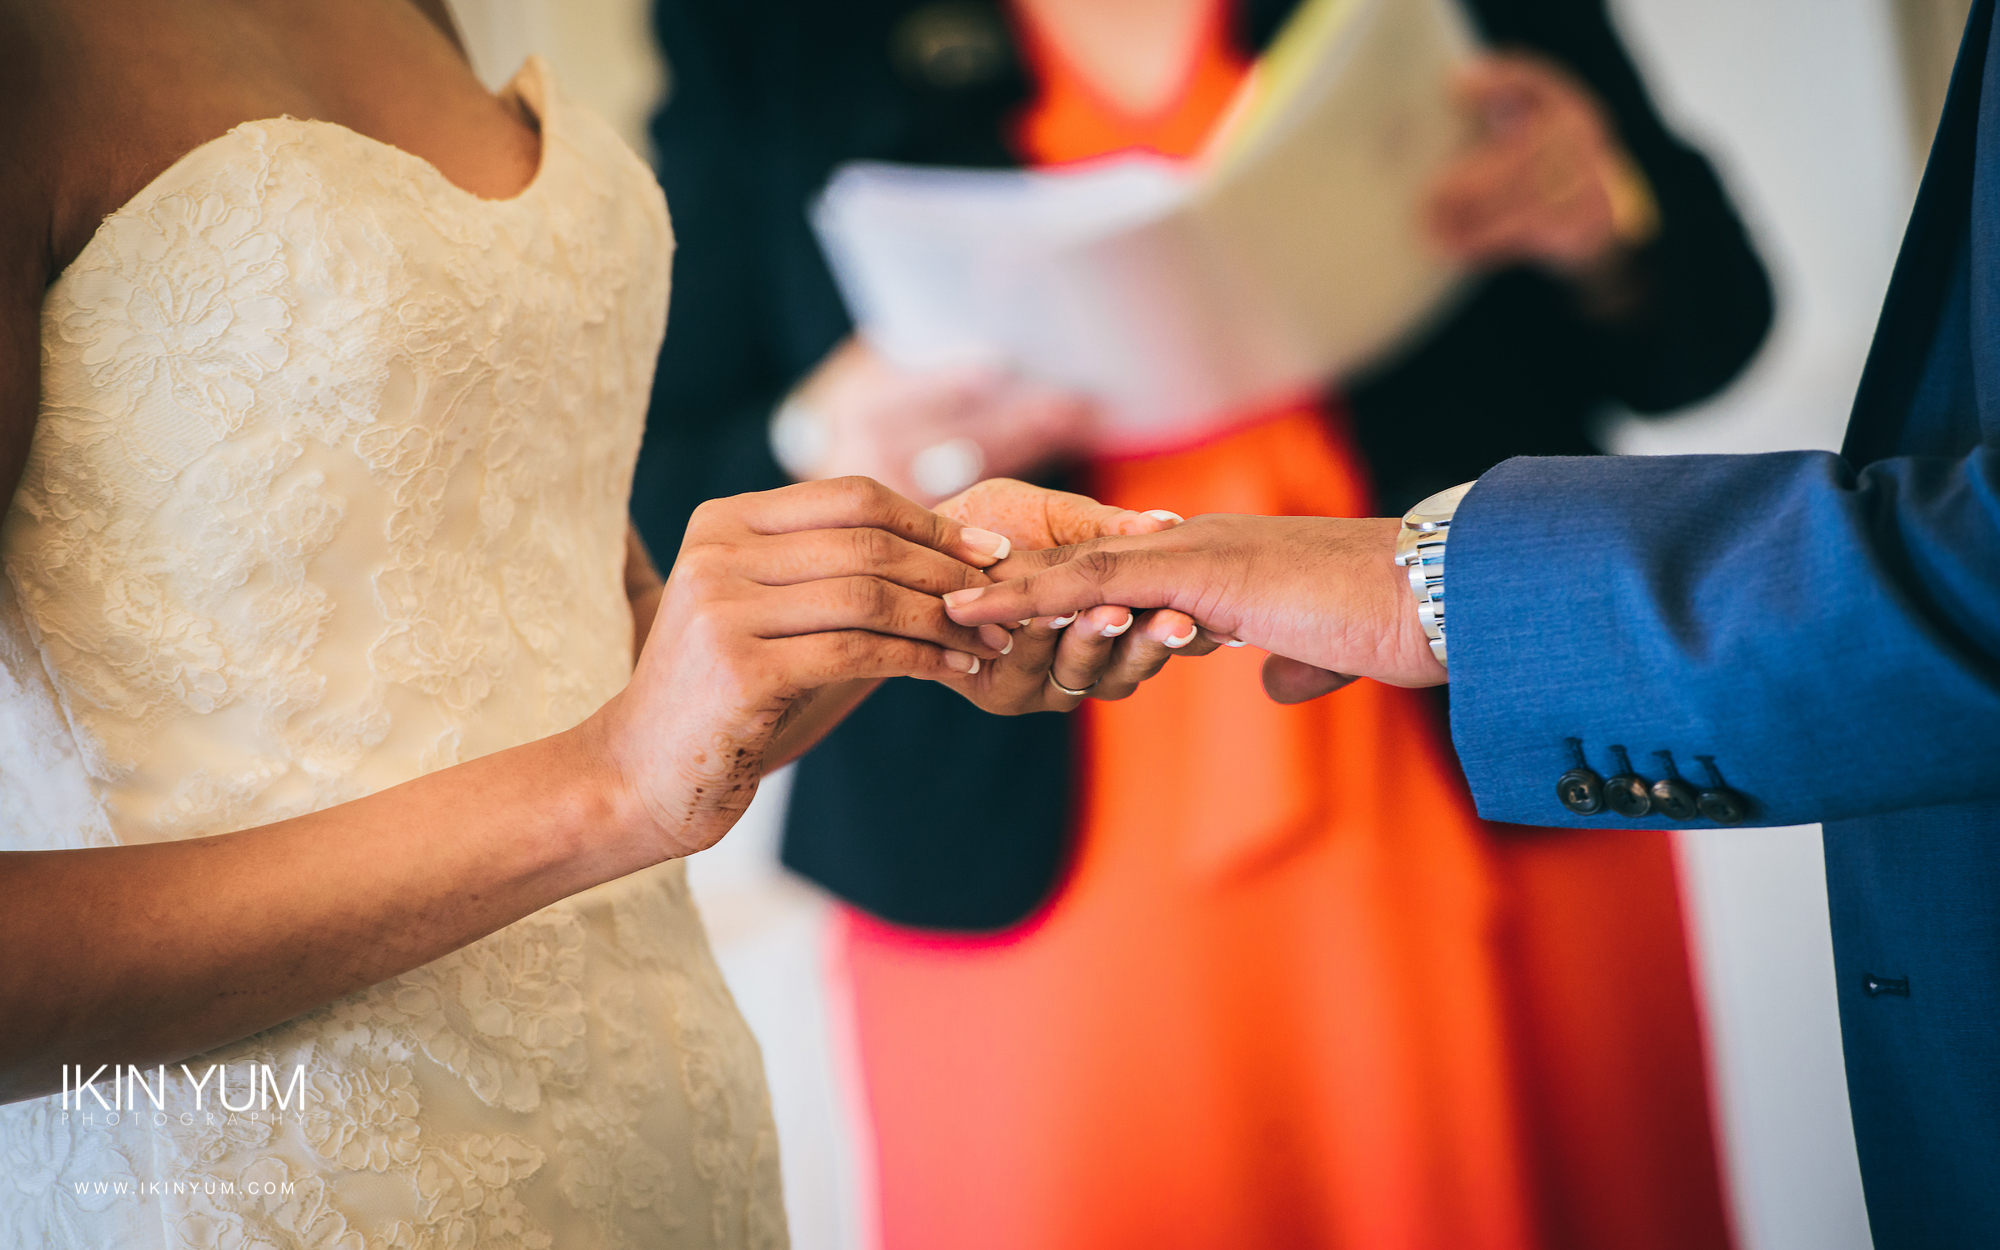 Froyle Park Indian Wedding - Ikin Yum Photography-057.jpg